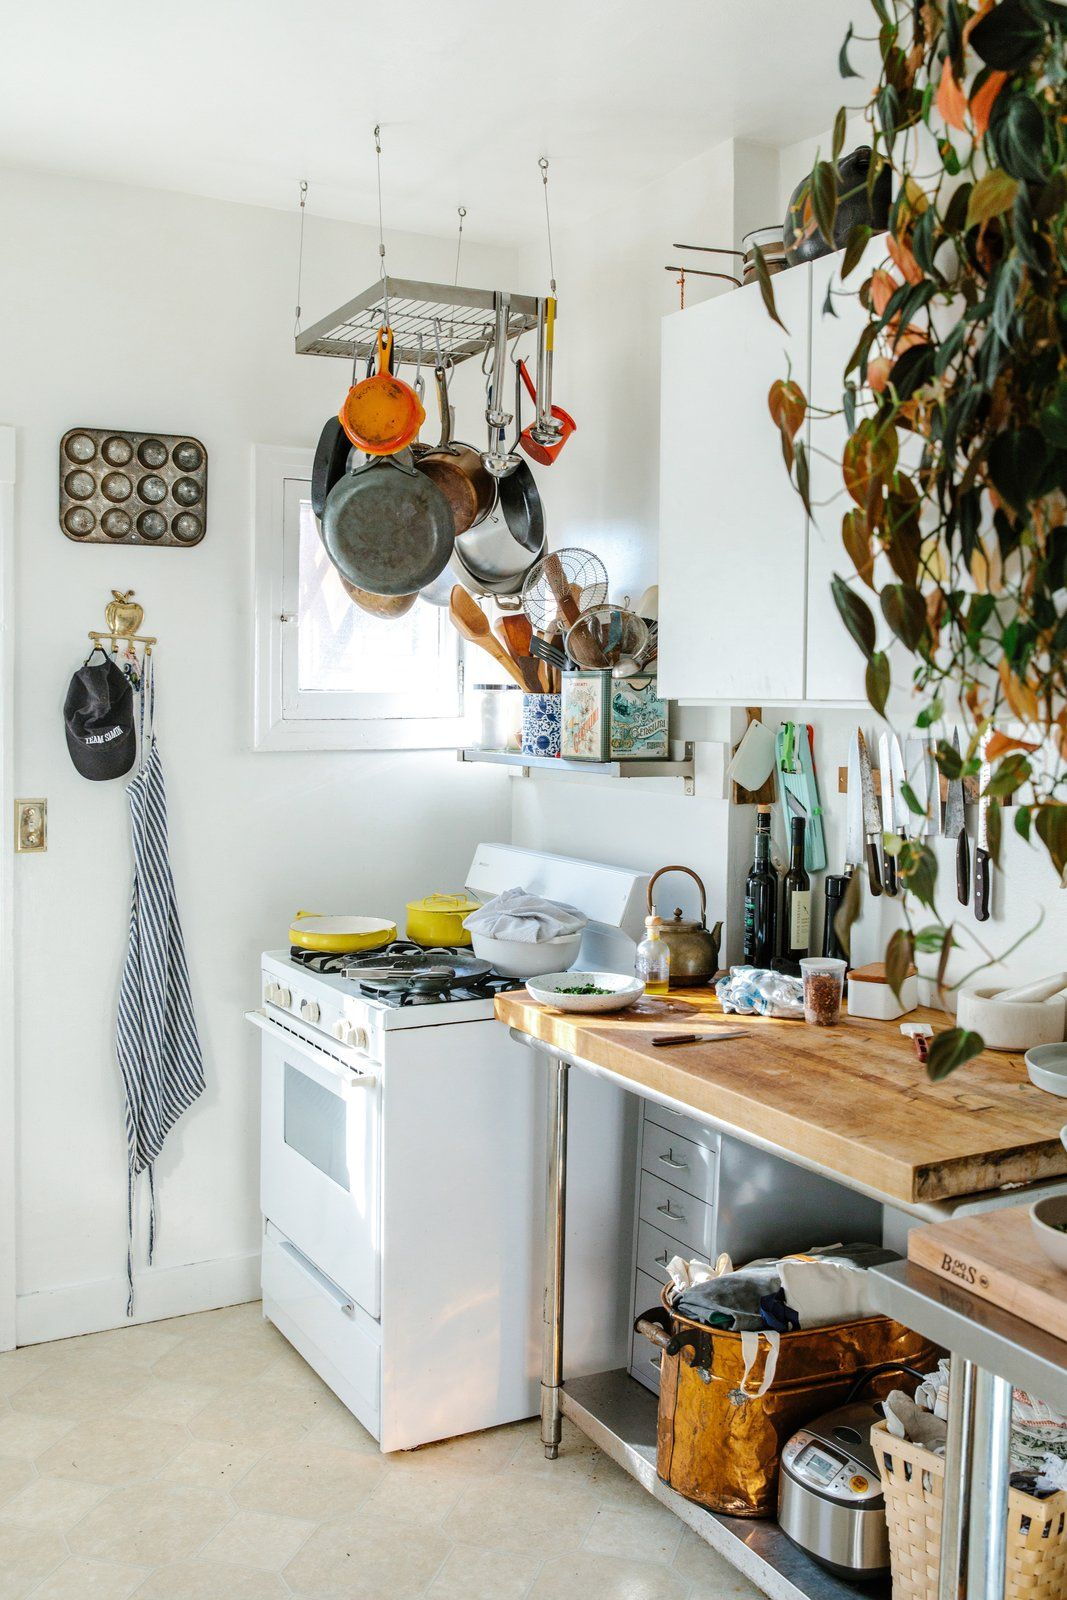 Best Selling Cookbook Author And Netflix Host Samin Nosrat Opens Her Doors Dwell Kitchen Kitchen Decor Wood Kitchen Counters